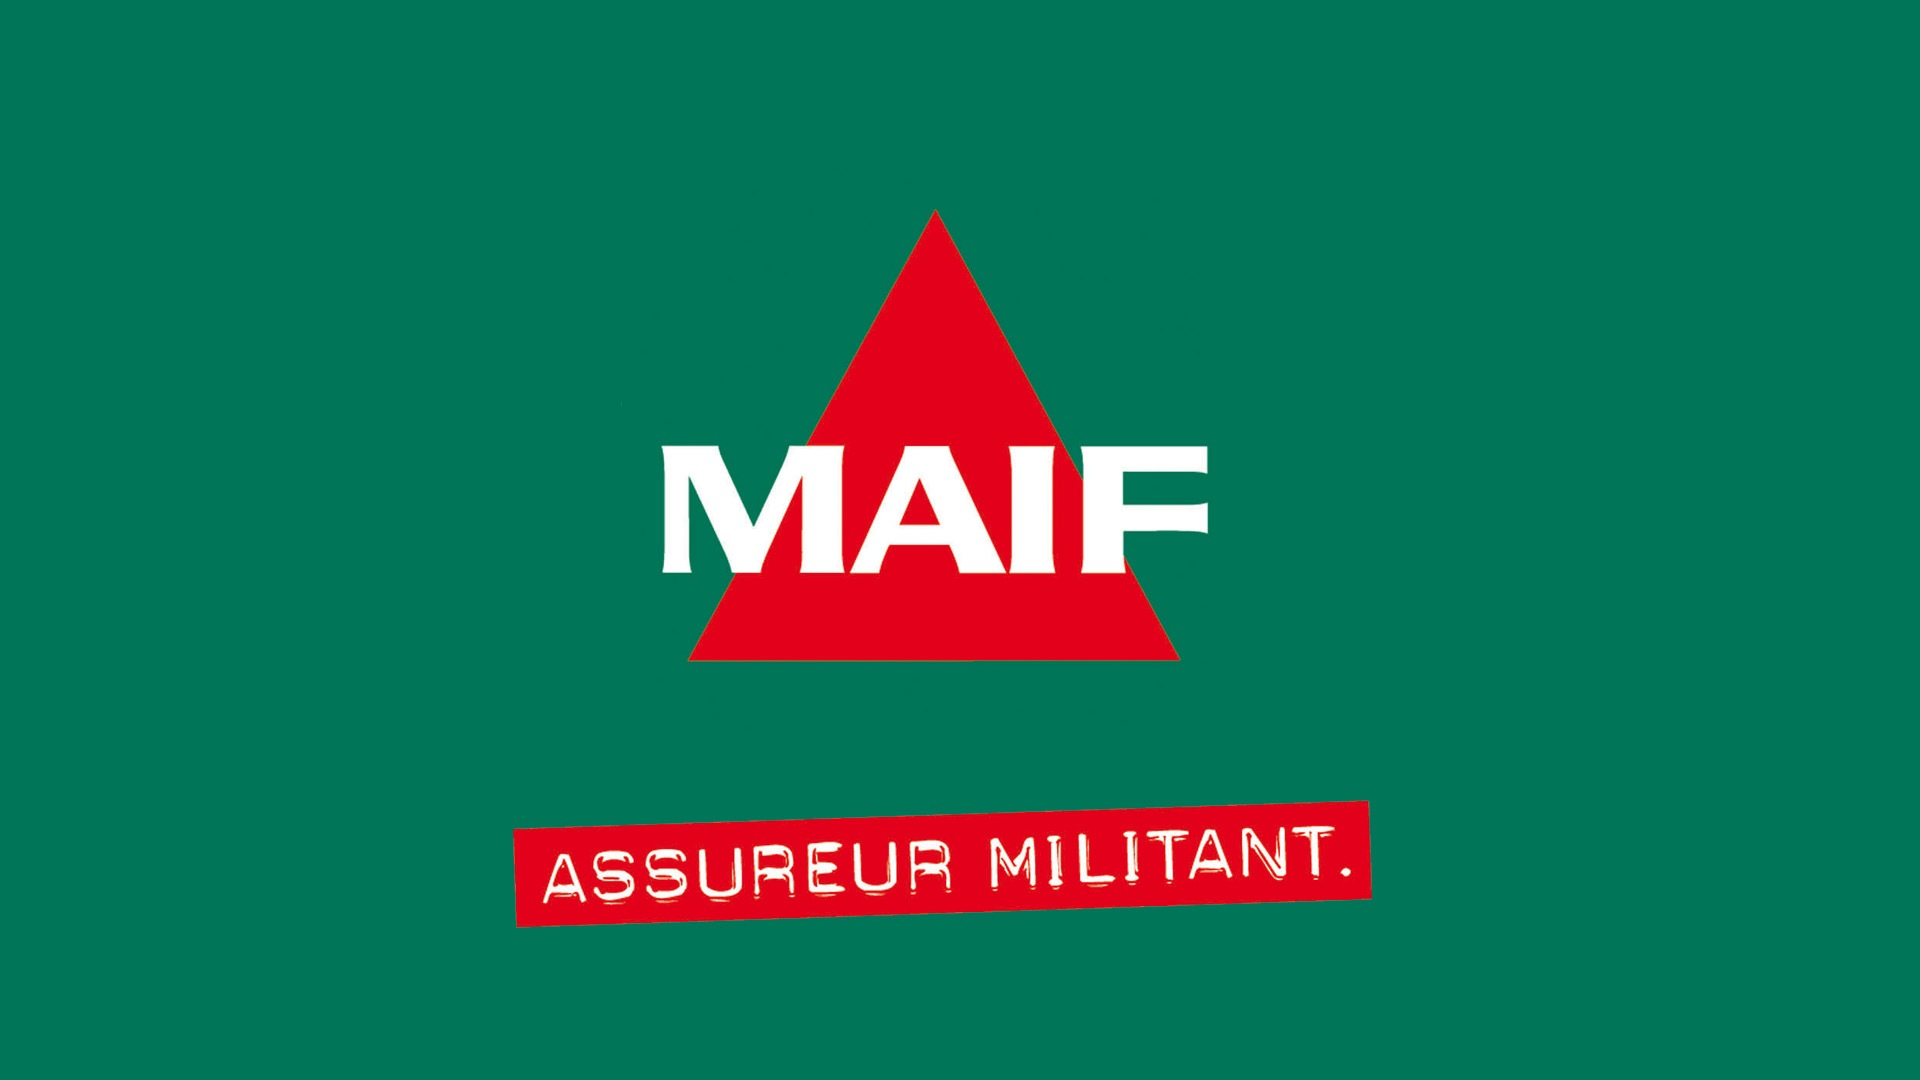 maif logo histoire et signification evolution symbole maif. Black Bedroom Furniture Sets. Home Design Ideas